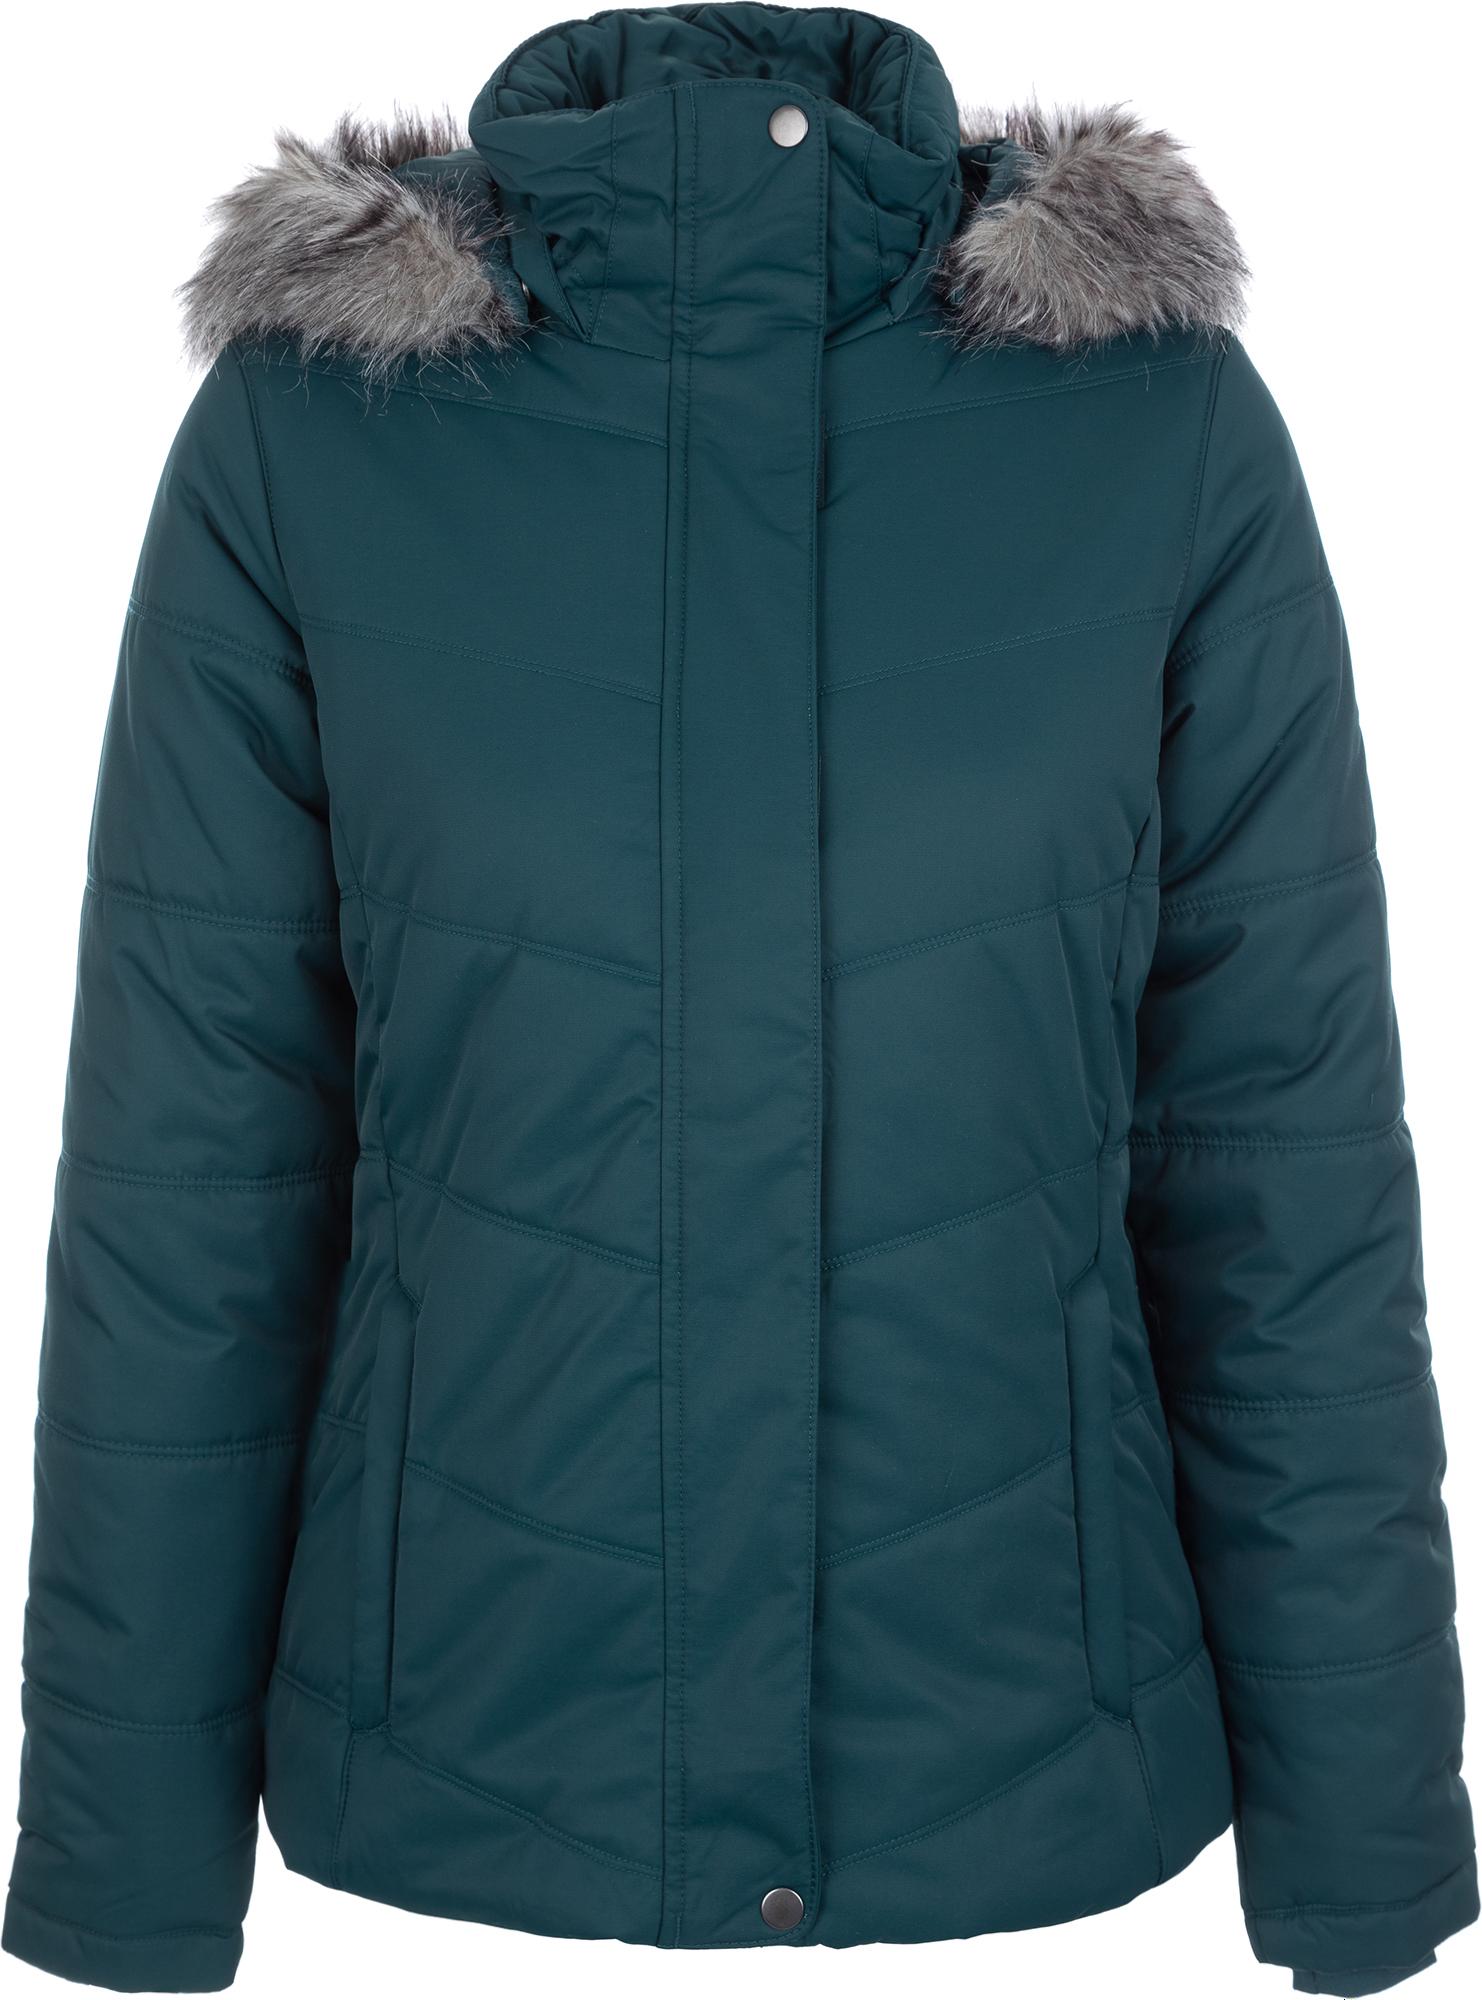 Фото - Columbia Куртка утепленная женская Columbia Deerpoint, размер 48 куртка женская trussardi цвет темно синий 36s00158 blue night размер l 46 48